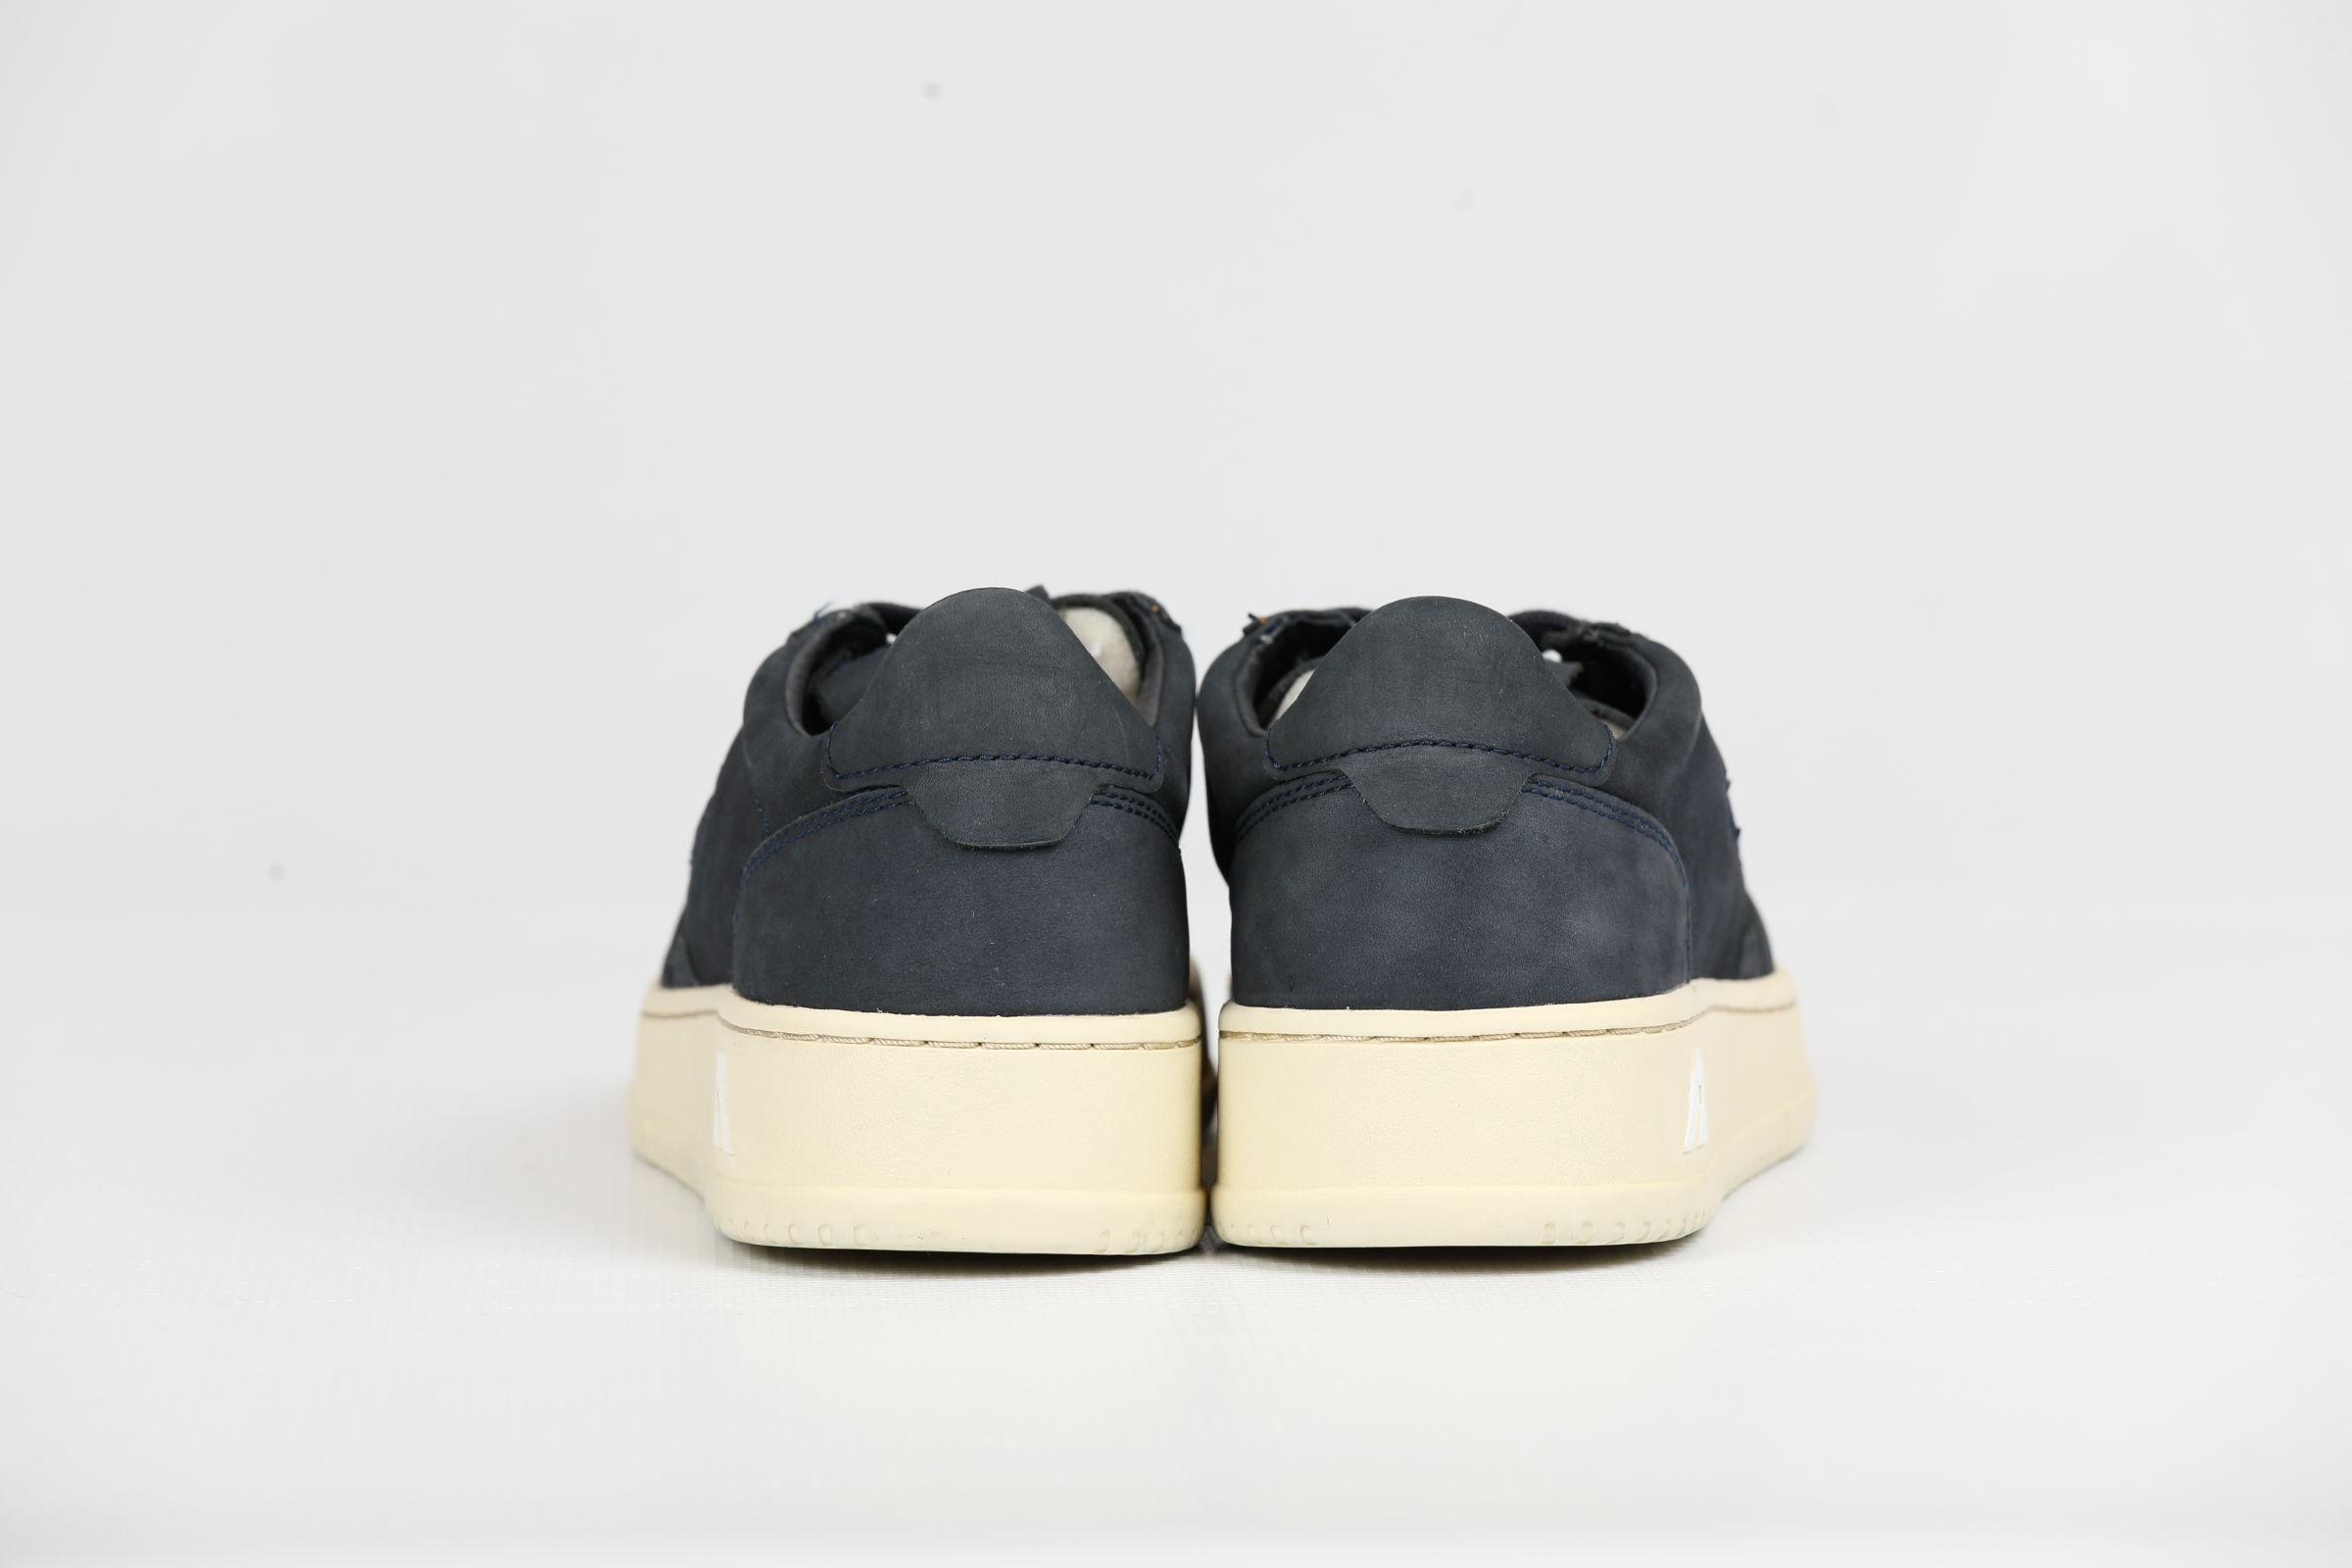 LOW MAN NABUK OCEAN AUTRY | Shoes | AULMNN08